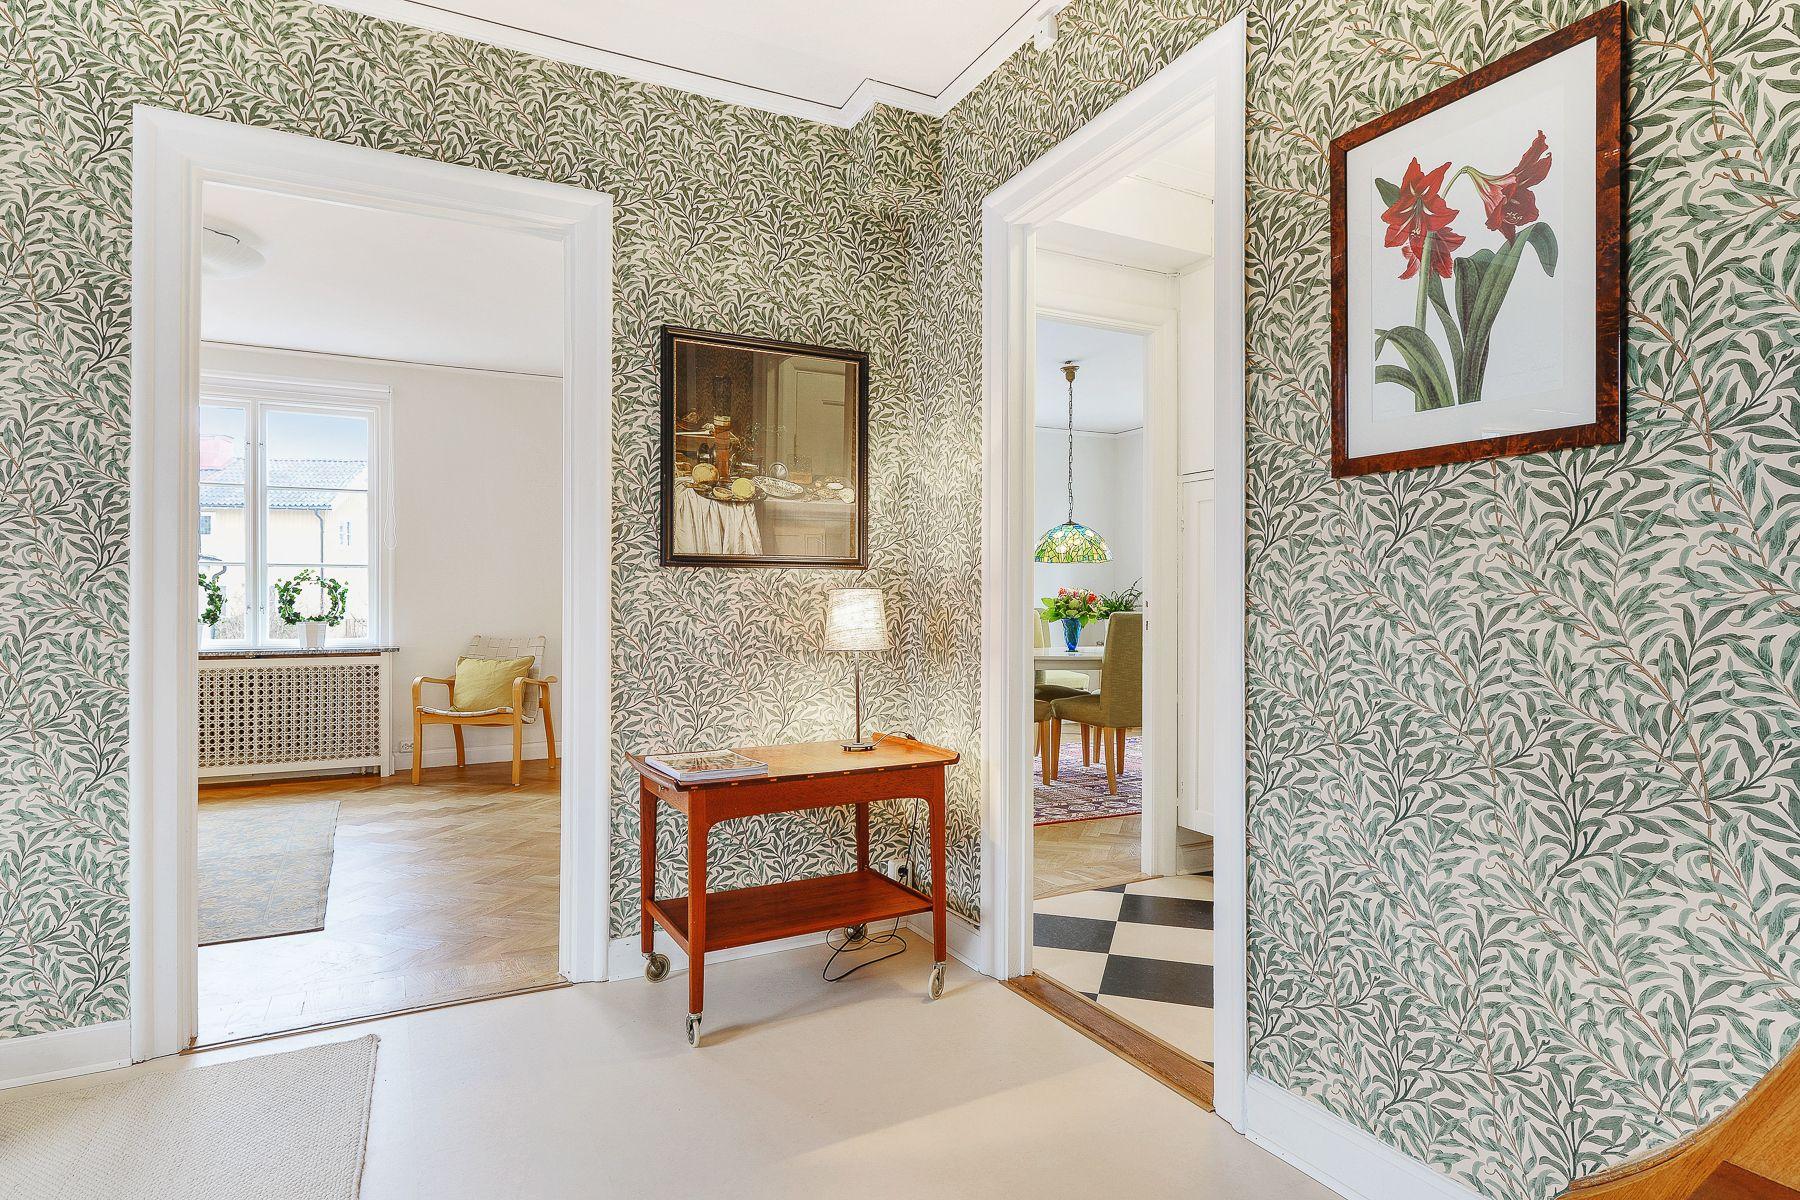 Home interior design kurs smakfull morristapet ger karaktär  wallpaper  pinterest  hall